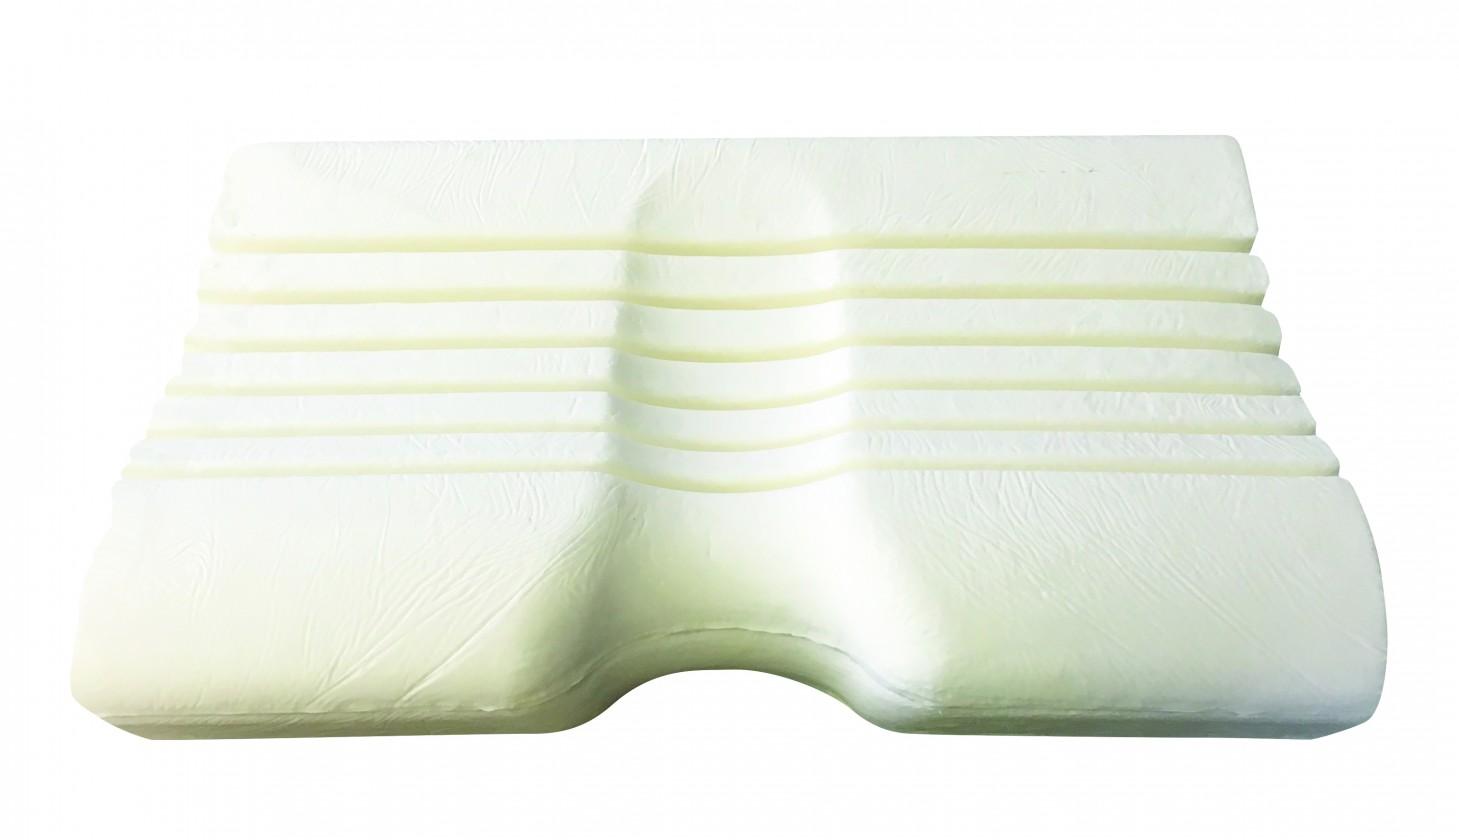 Anatomický polštář Van - ortopedický polštář, Visco líná pěna, 53x33x11